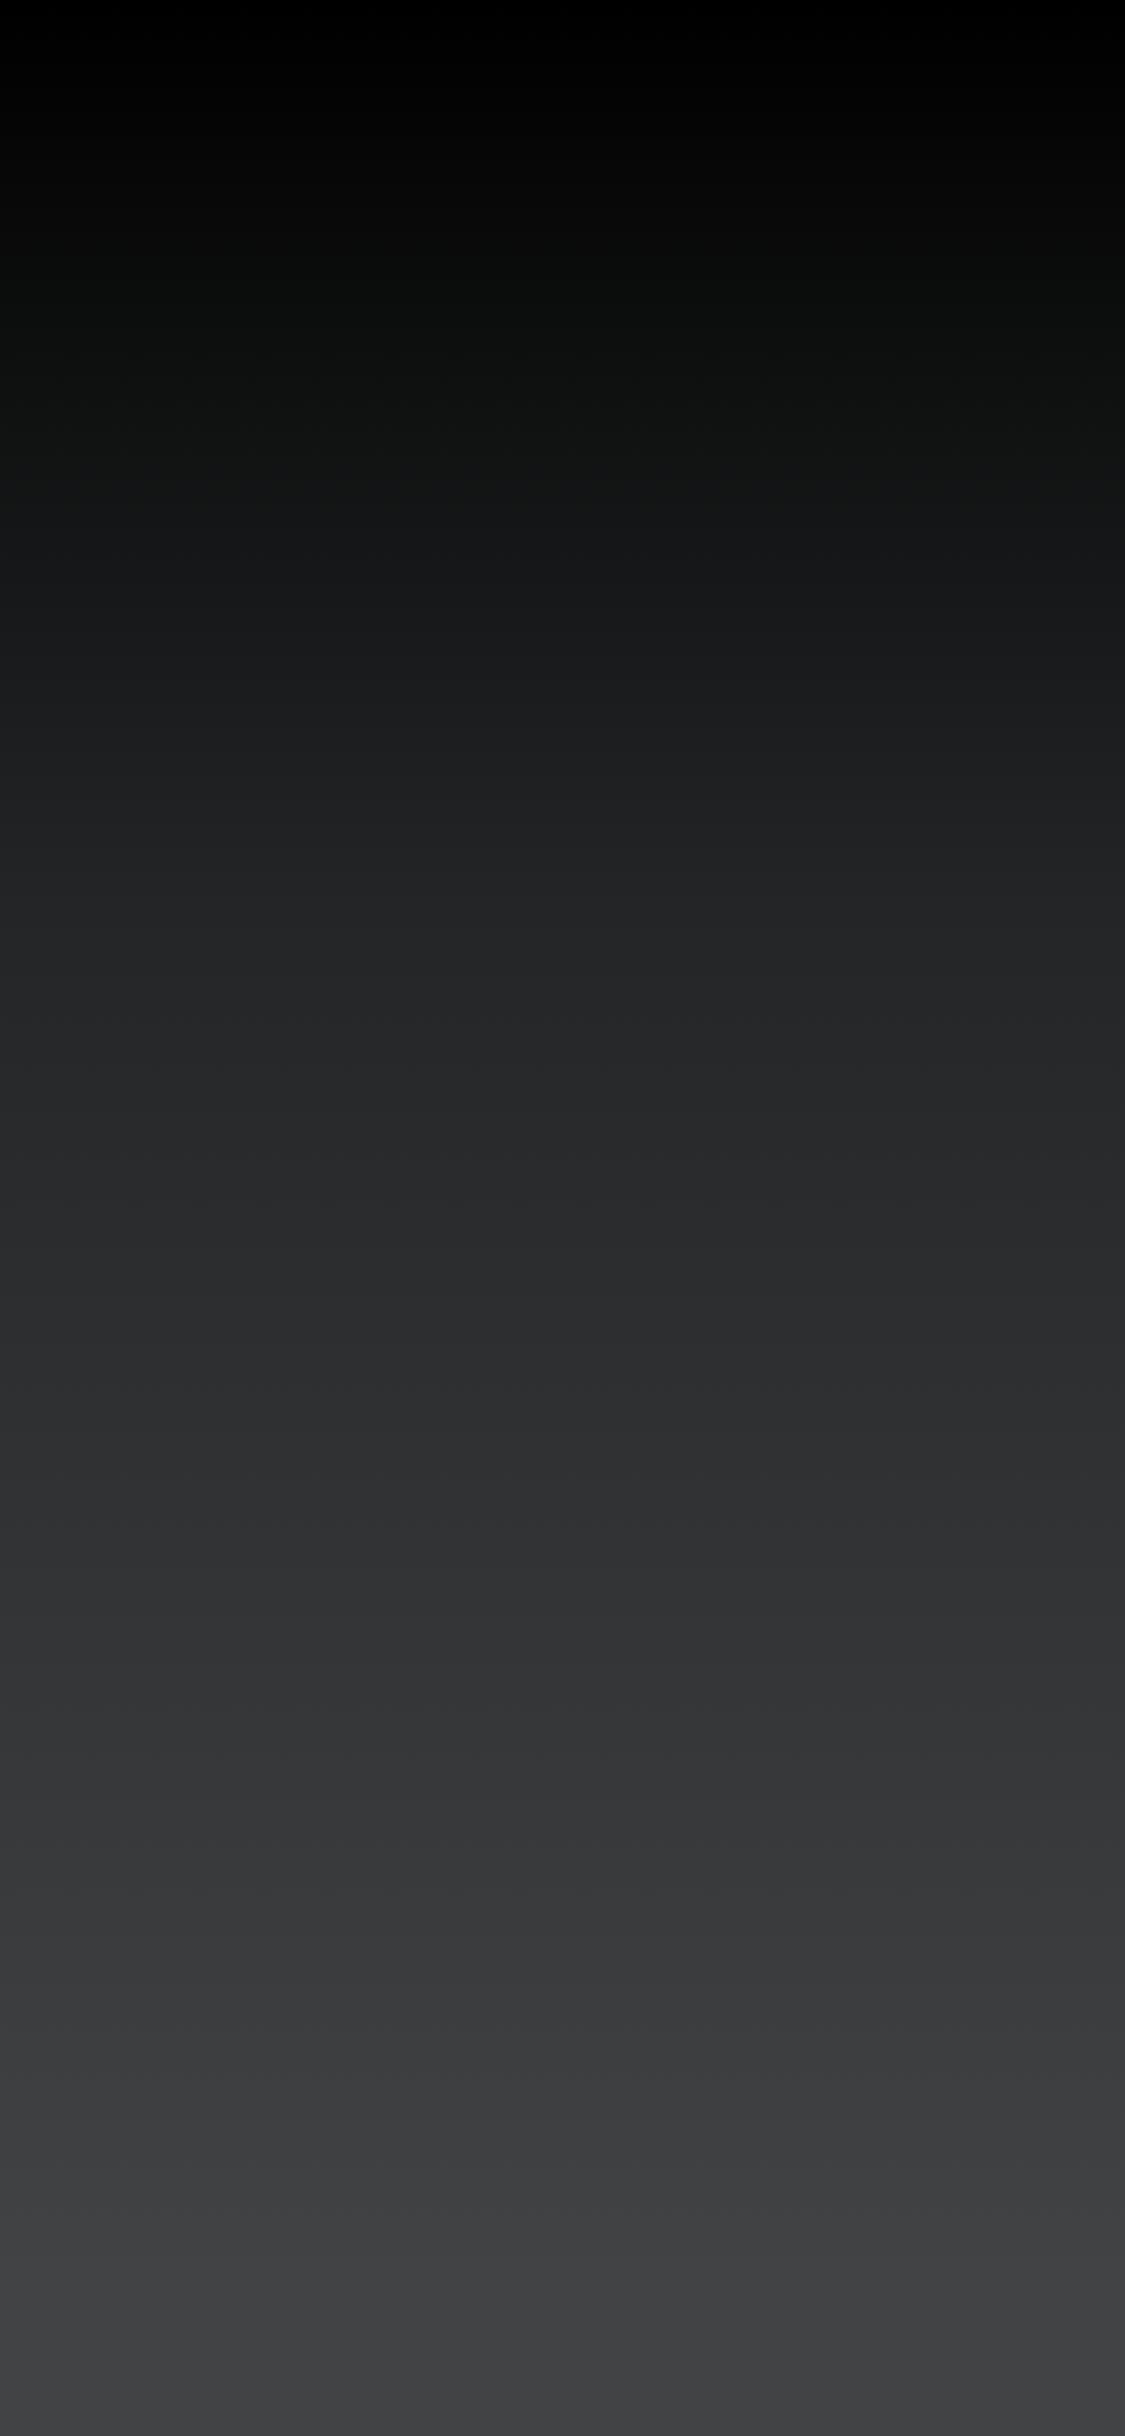 Notchless Wallpaper Iphone X Iphone Xをノッチレスに見せるシンプルな壁紙(12枚) 噂のappleフリークス🌞